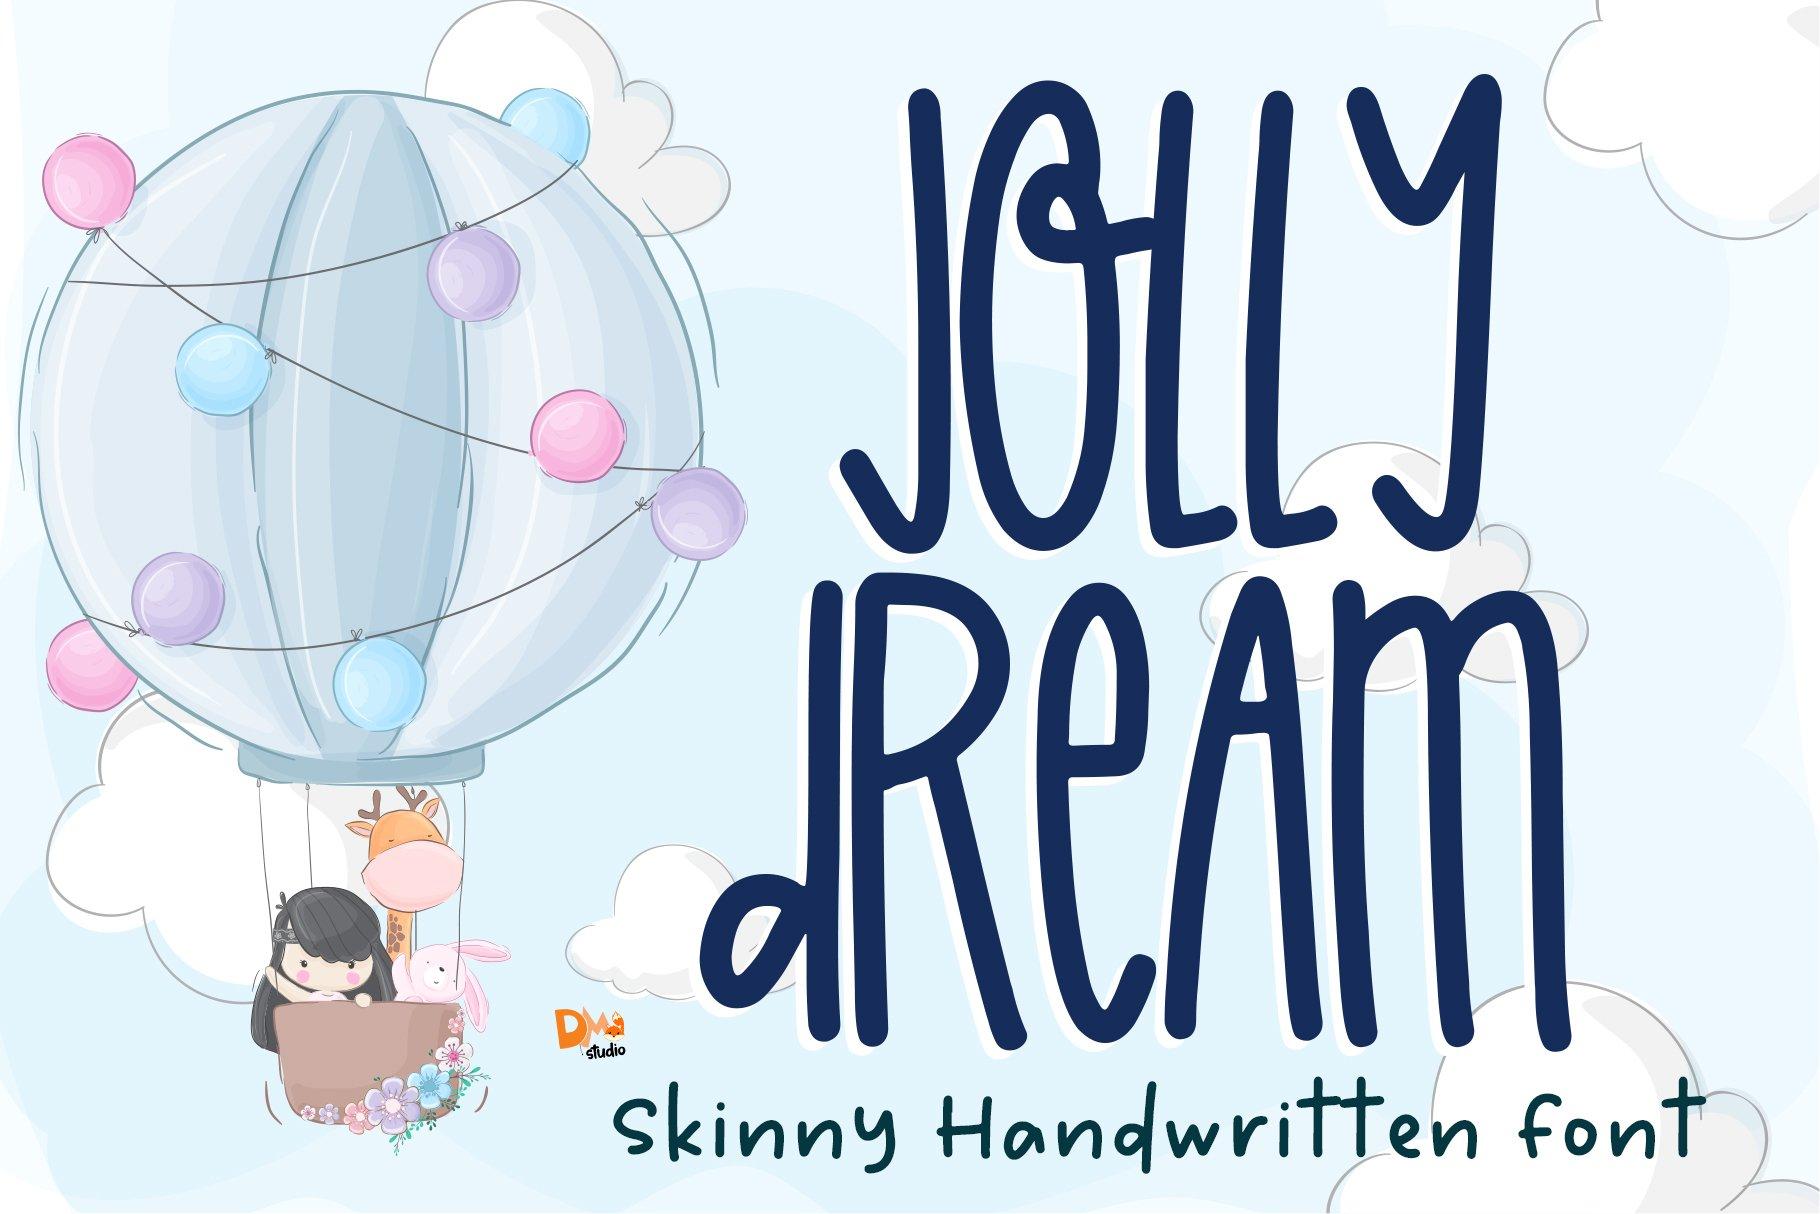 Jolly Dream - Skinny Handwritten Font example image 1